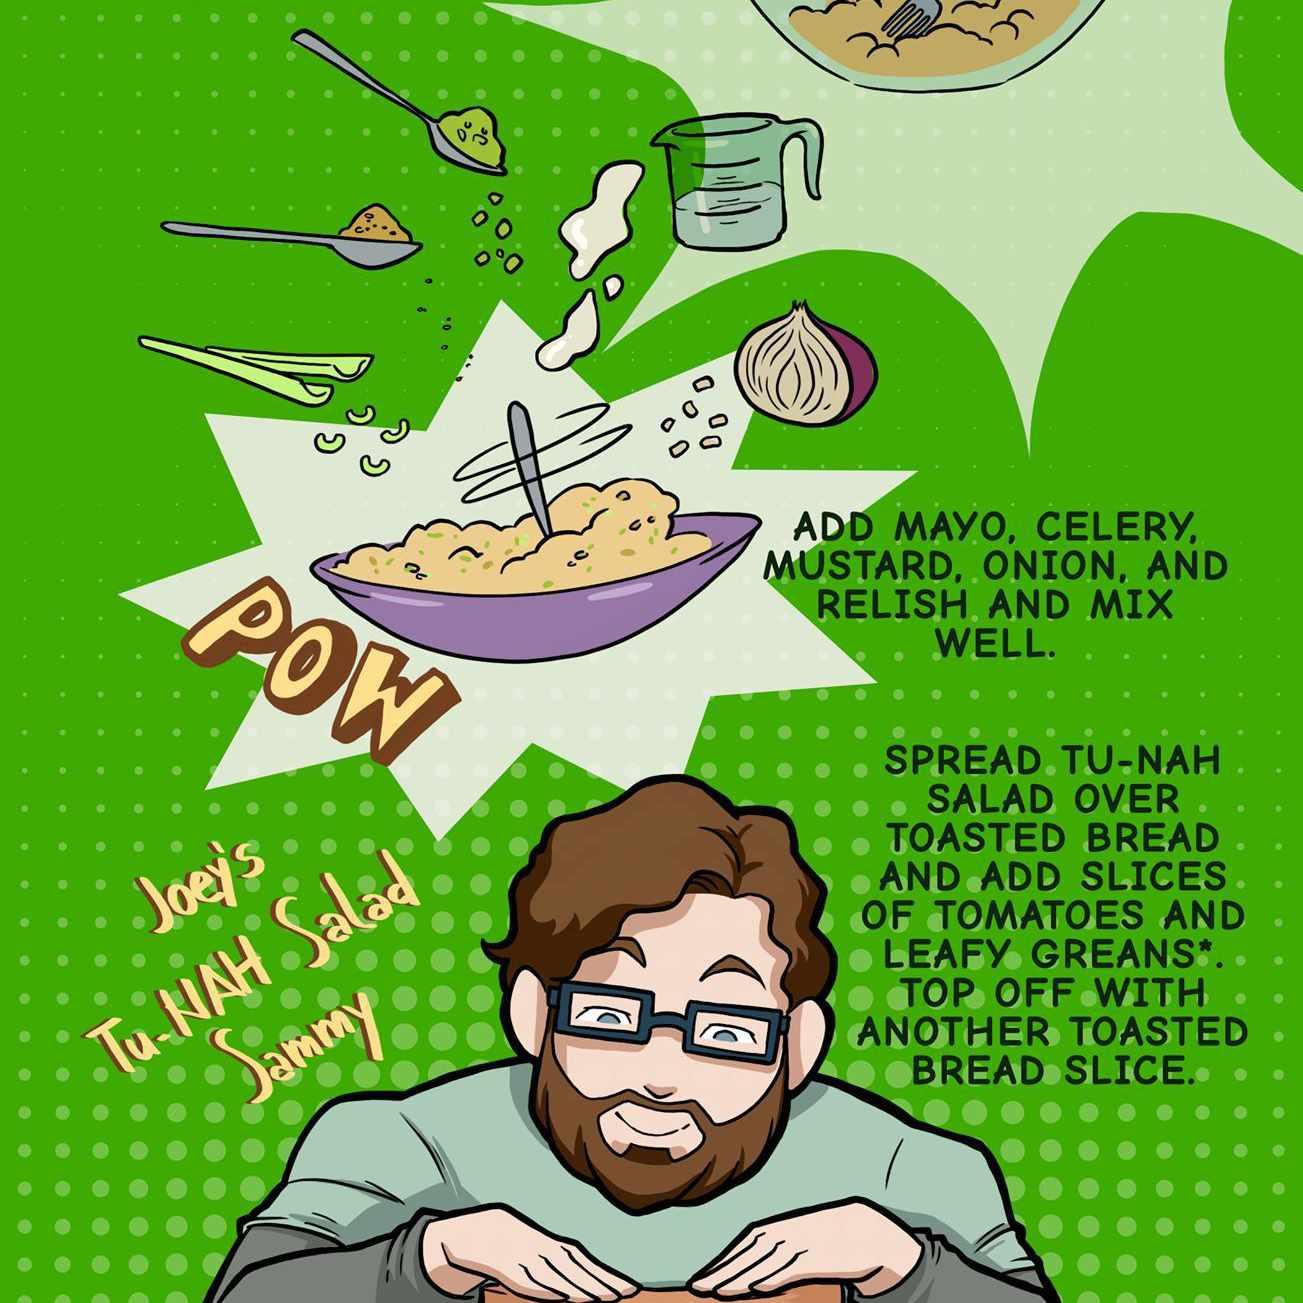 Spooniverse tu-NAH salad recipe